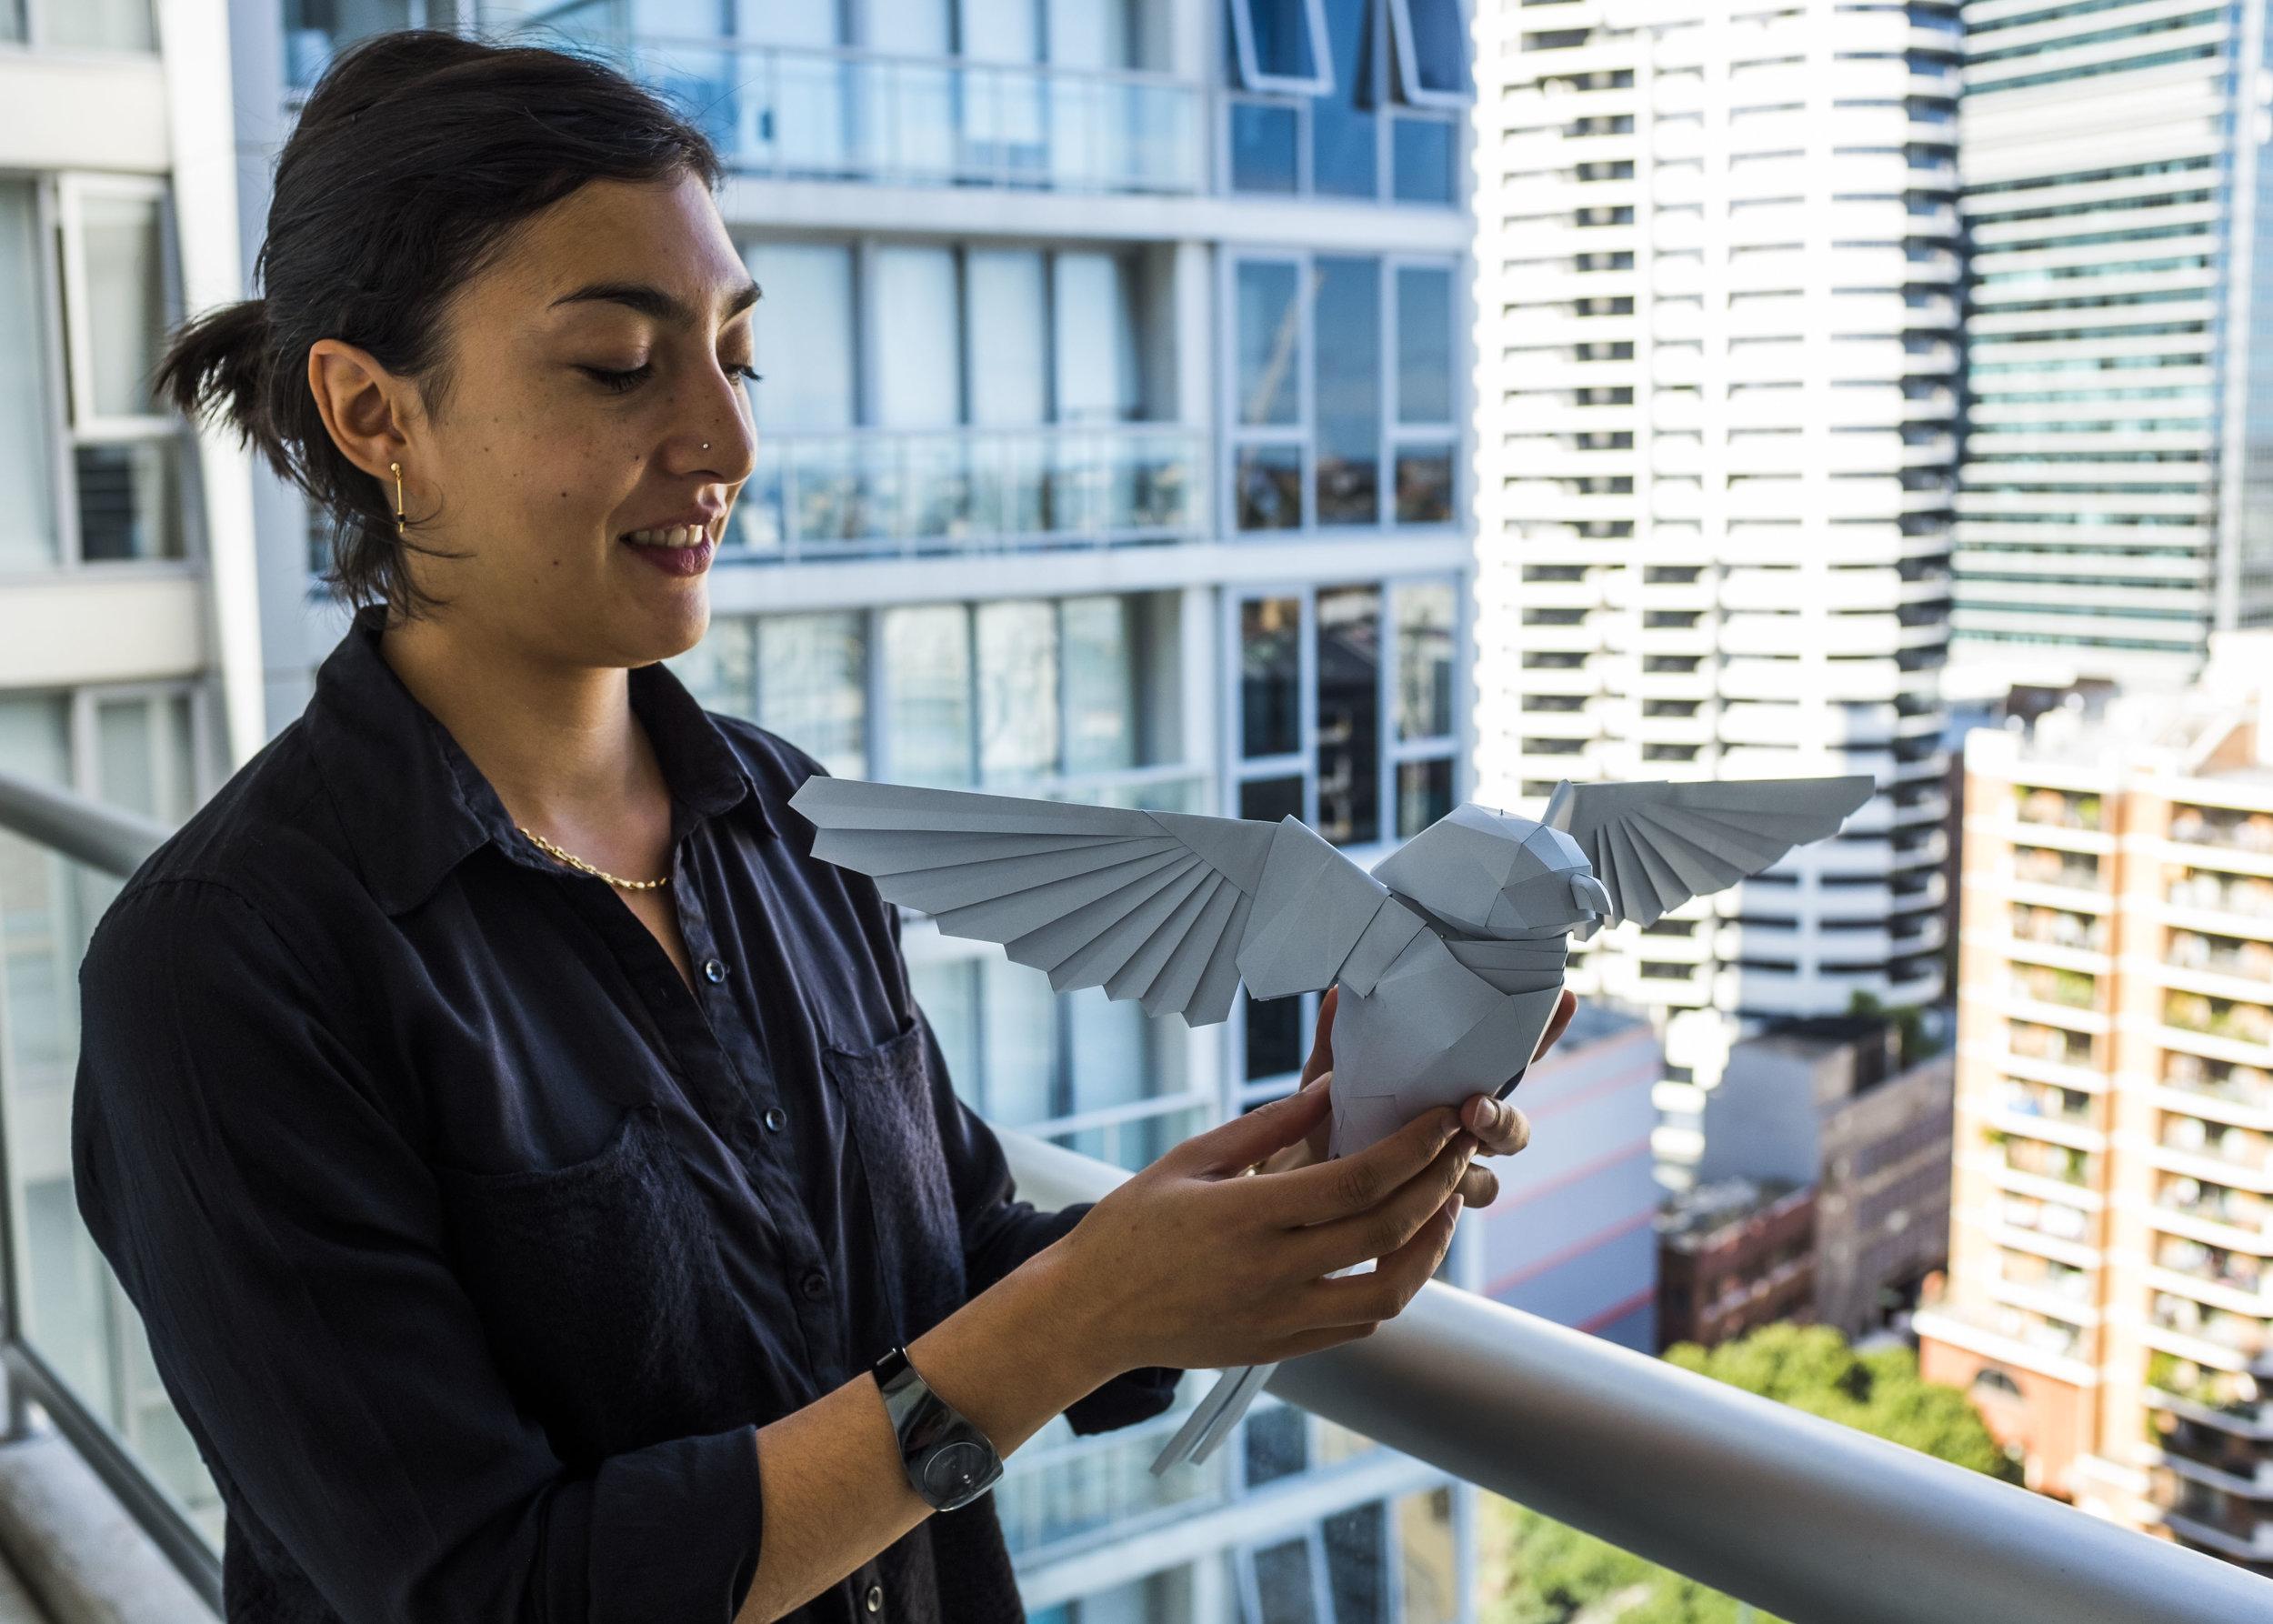 Marine et un prototype de l'oiseau de Telstra.